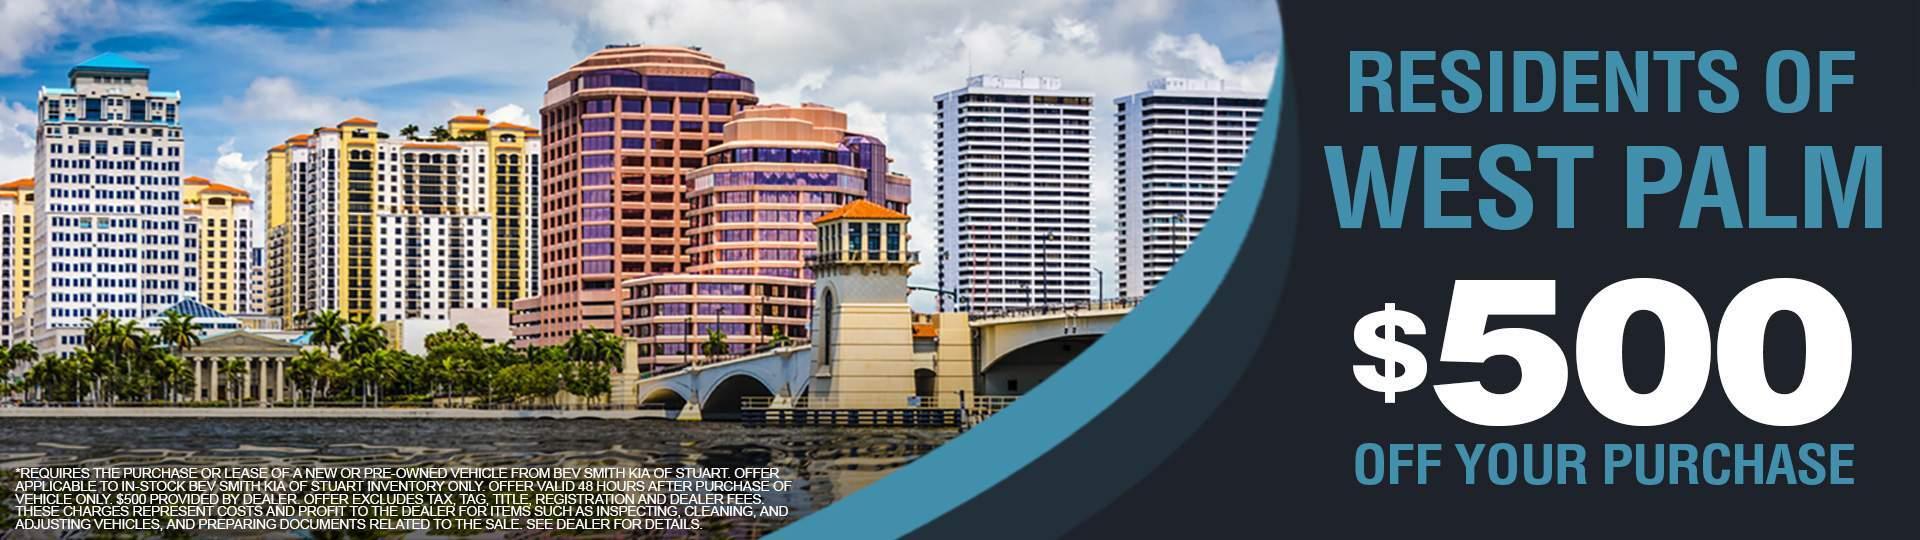 Employment Services West Palm Beach Fl